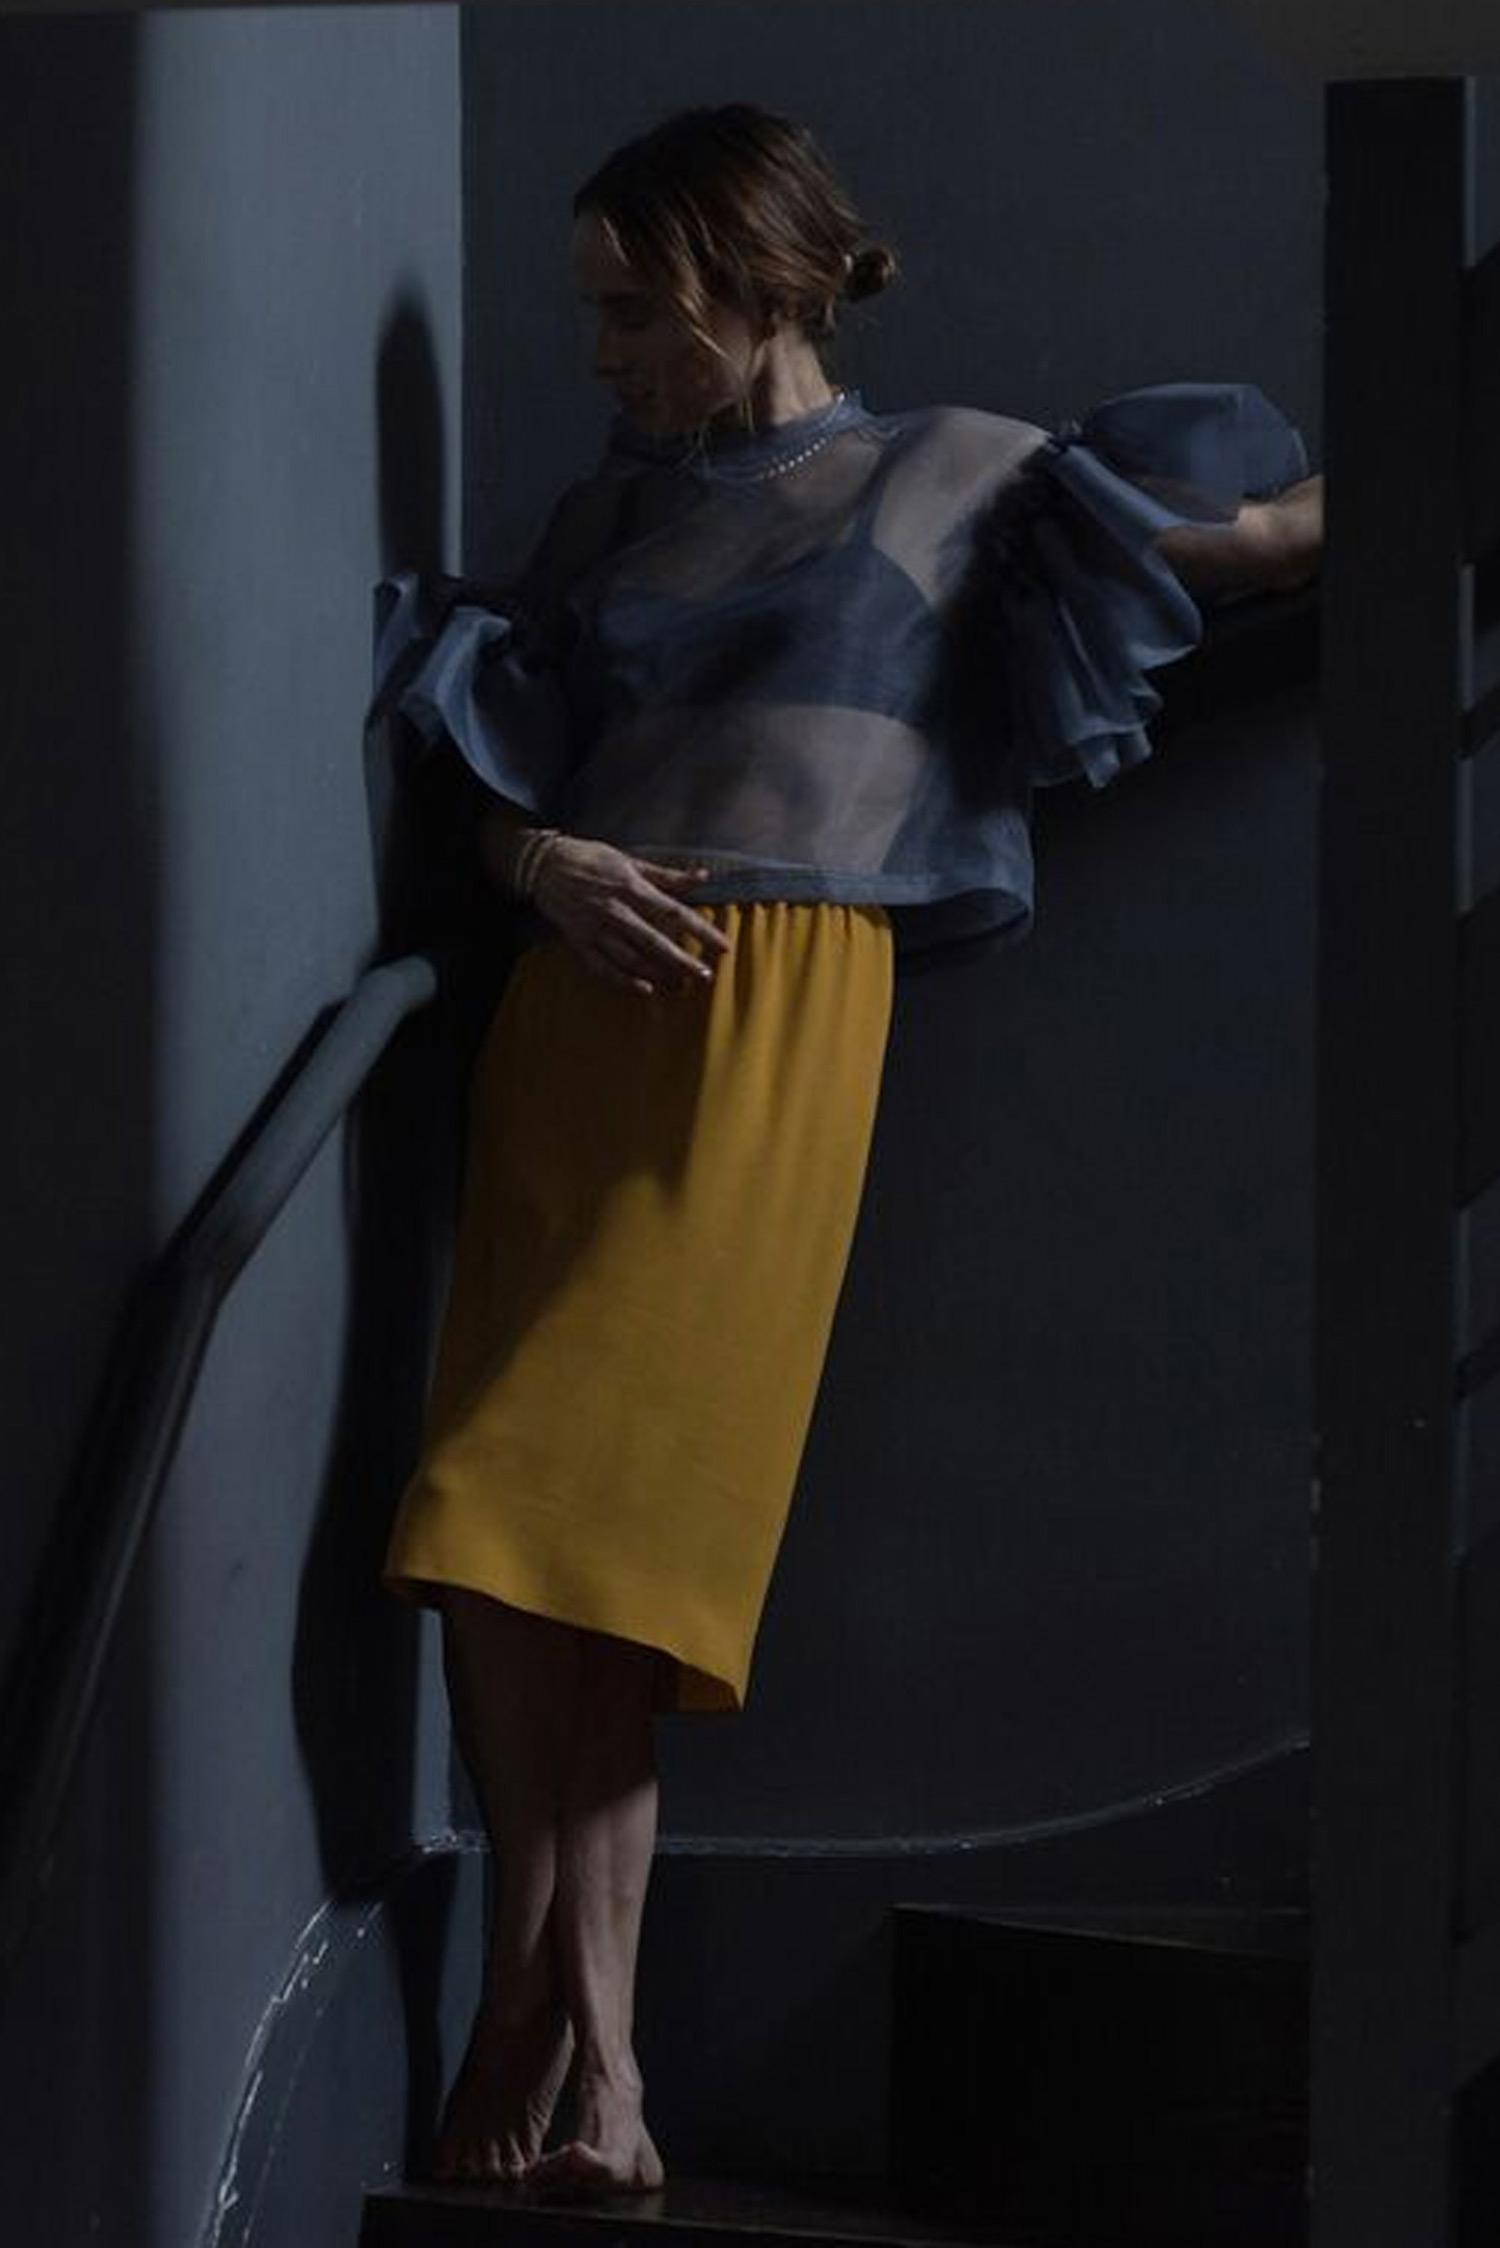 Rosa Macher Organza Top in Gris Foncé and skirt 001 in Mustard